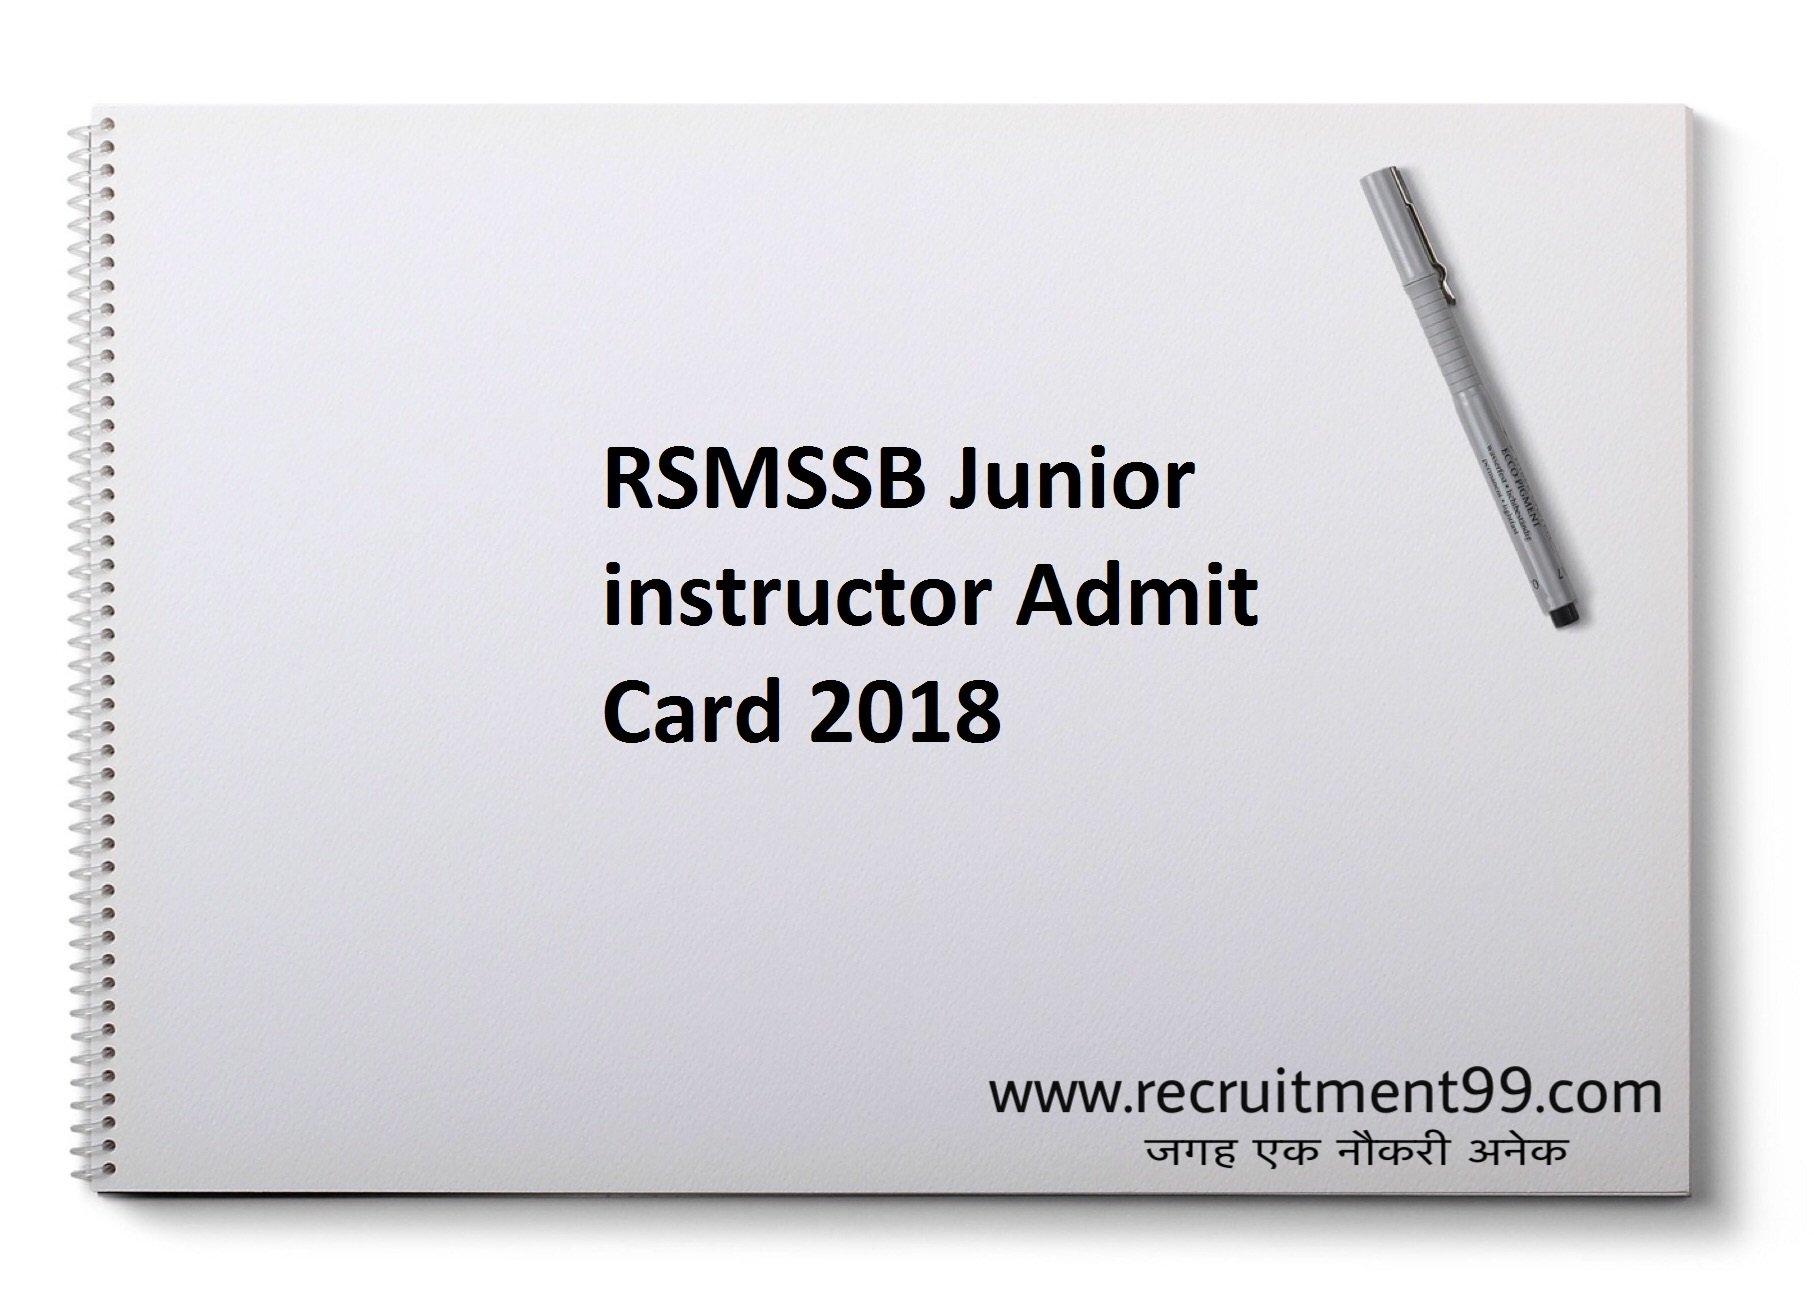 RSMSSB Junior instructor Call Letter 2018